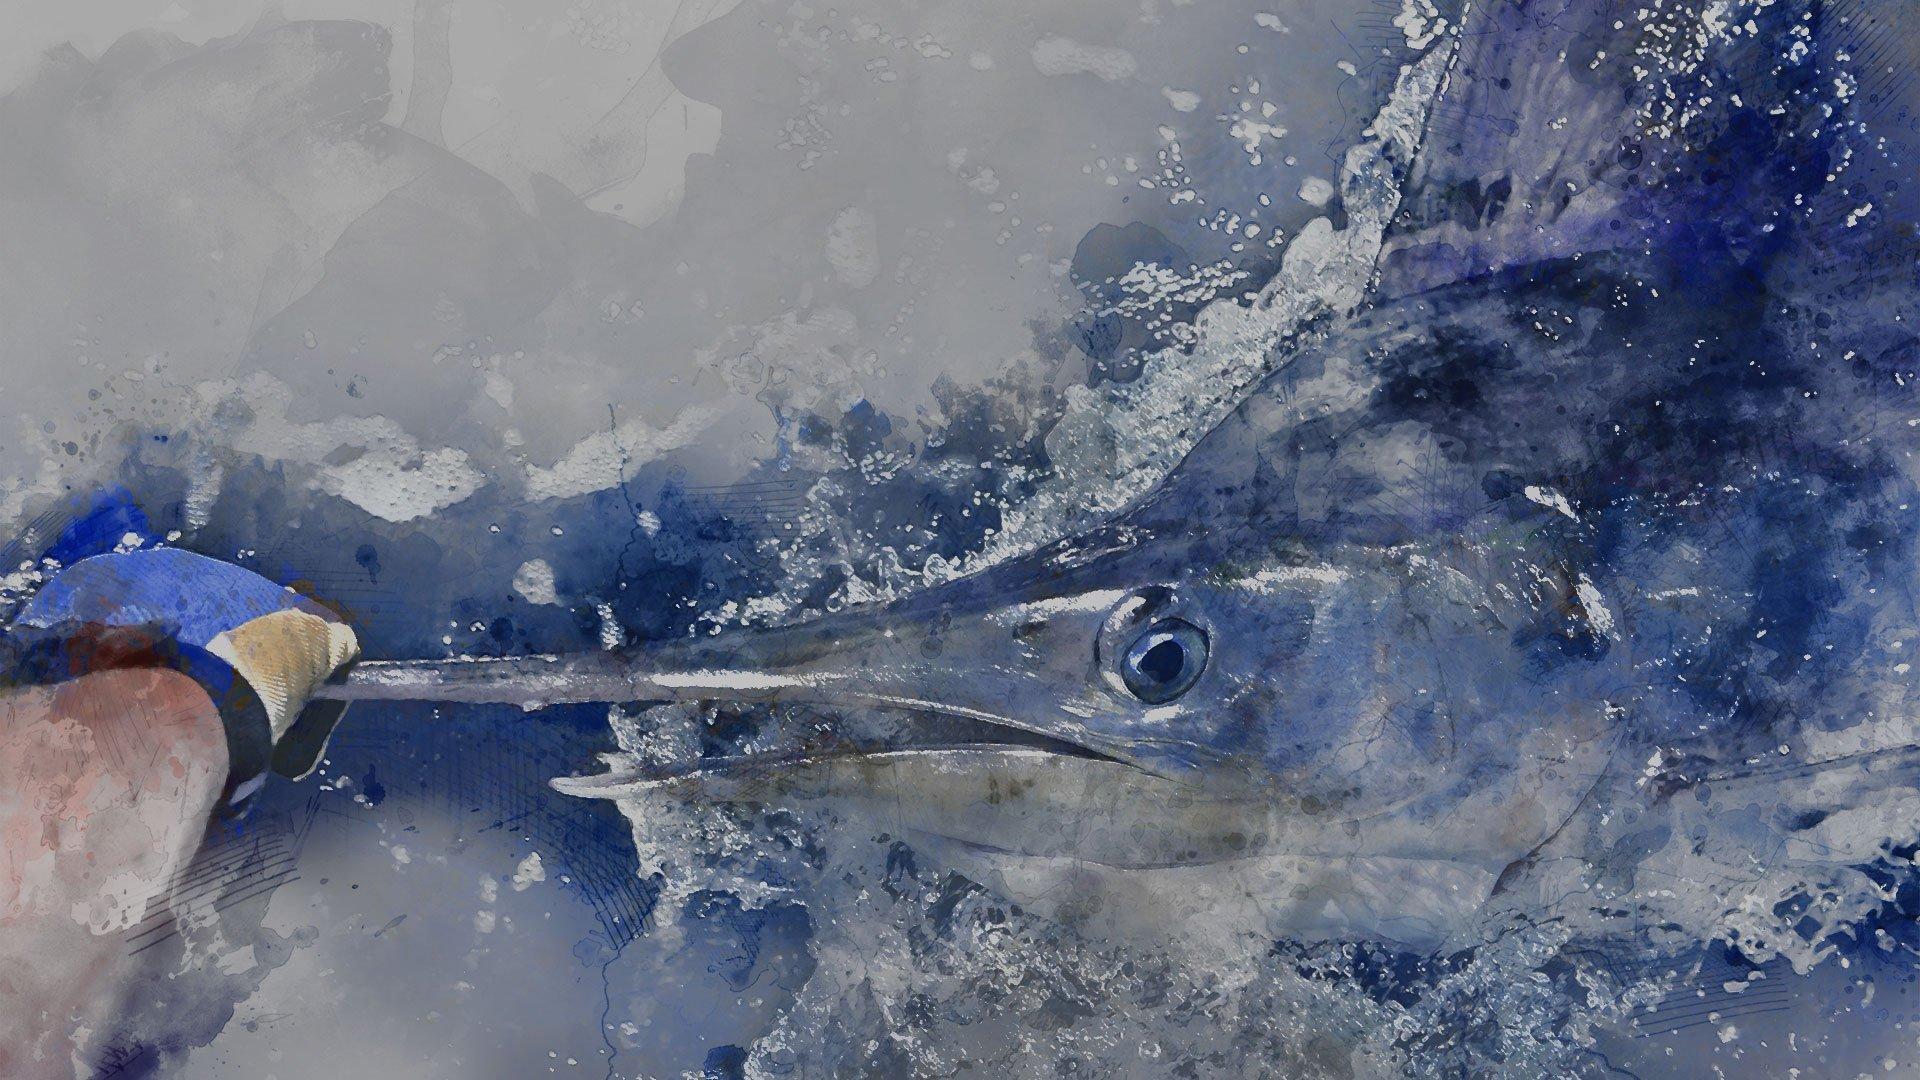 White Marlin Release